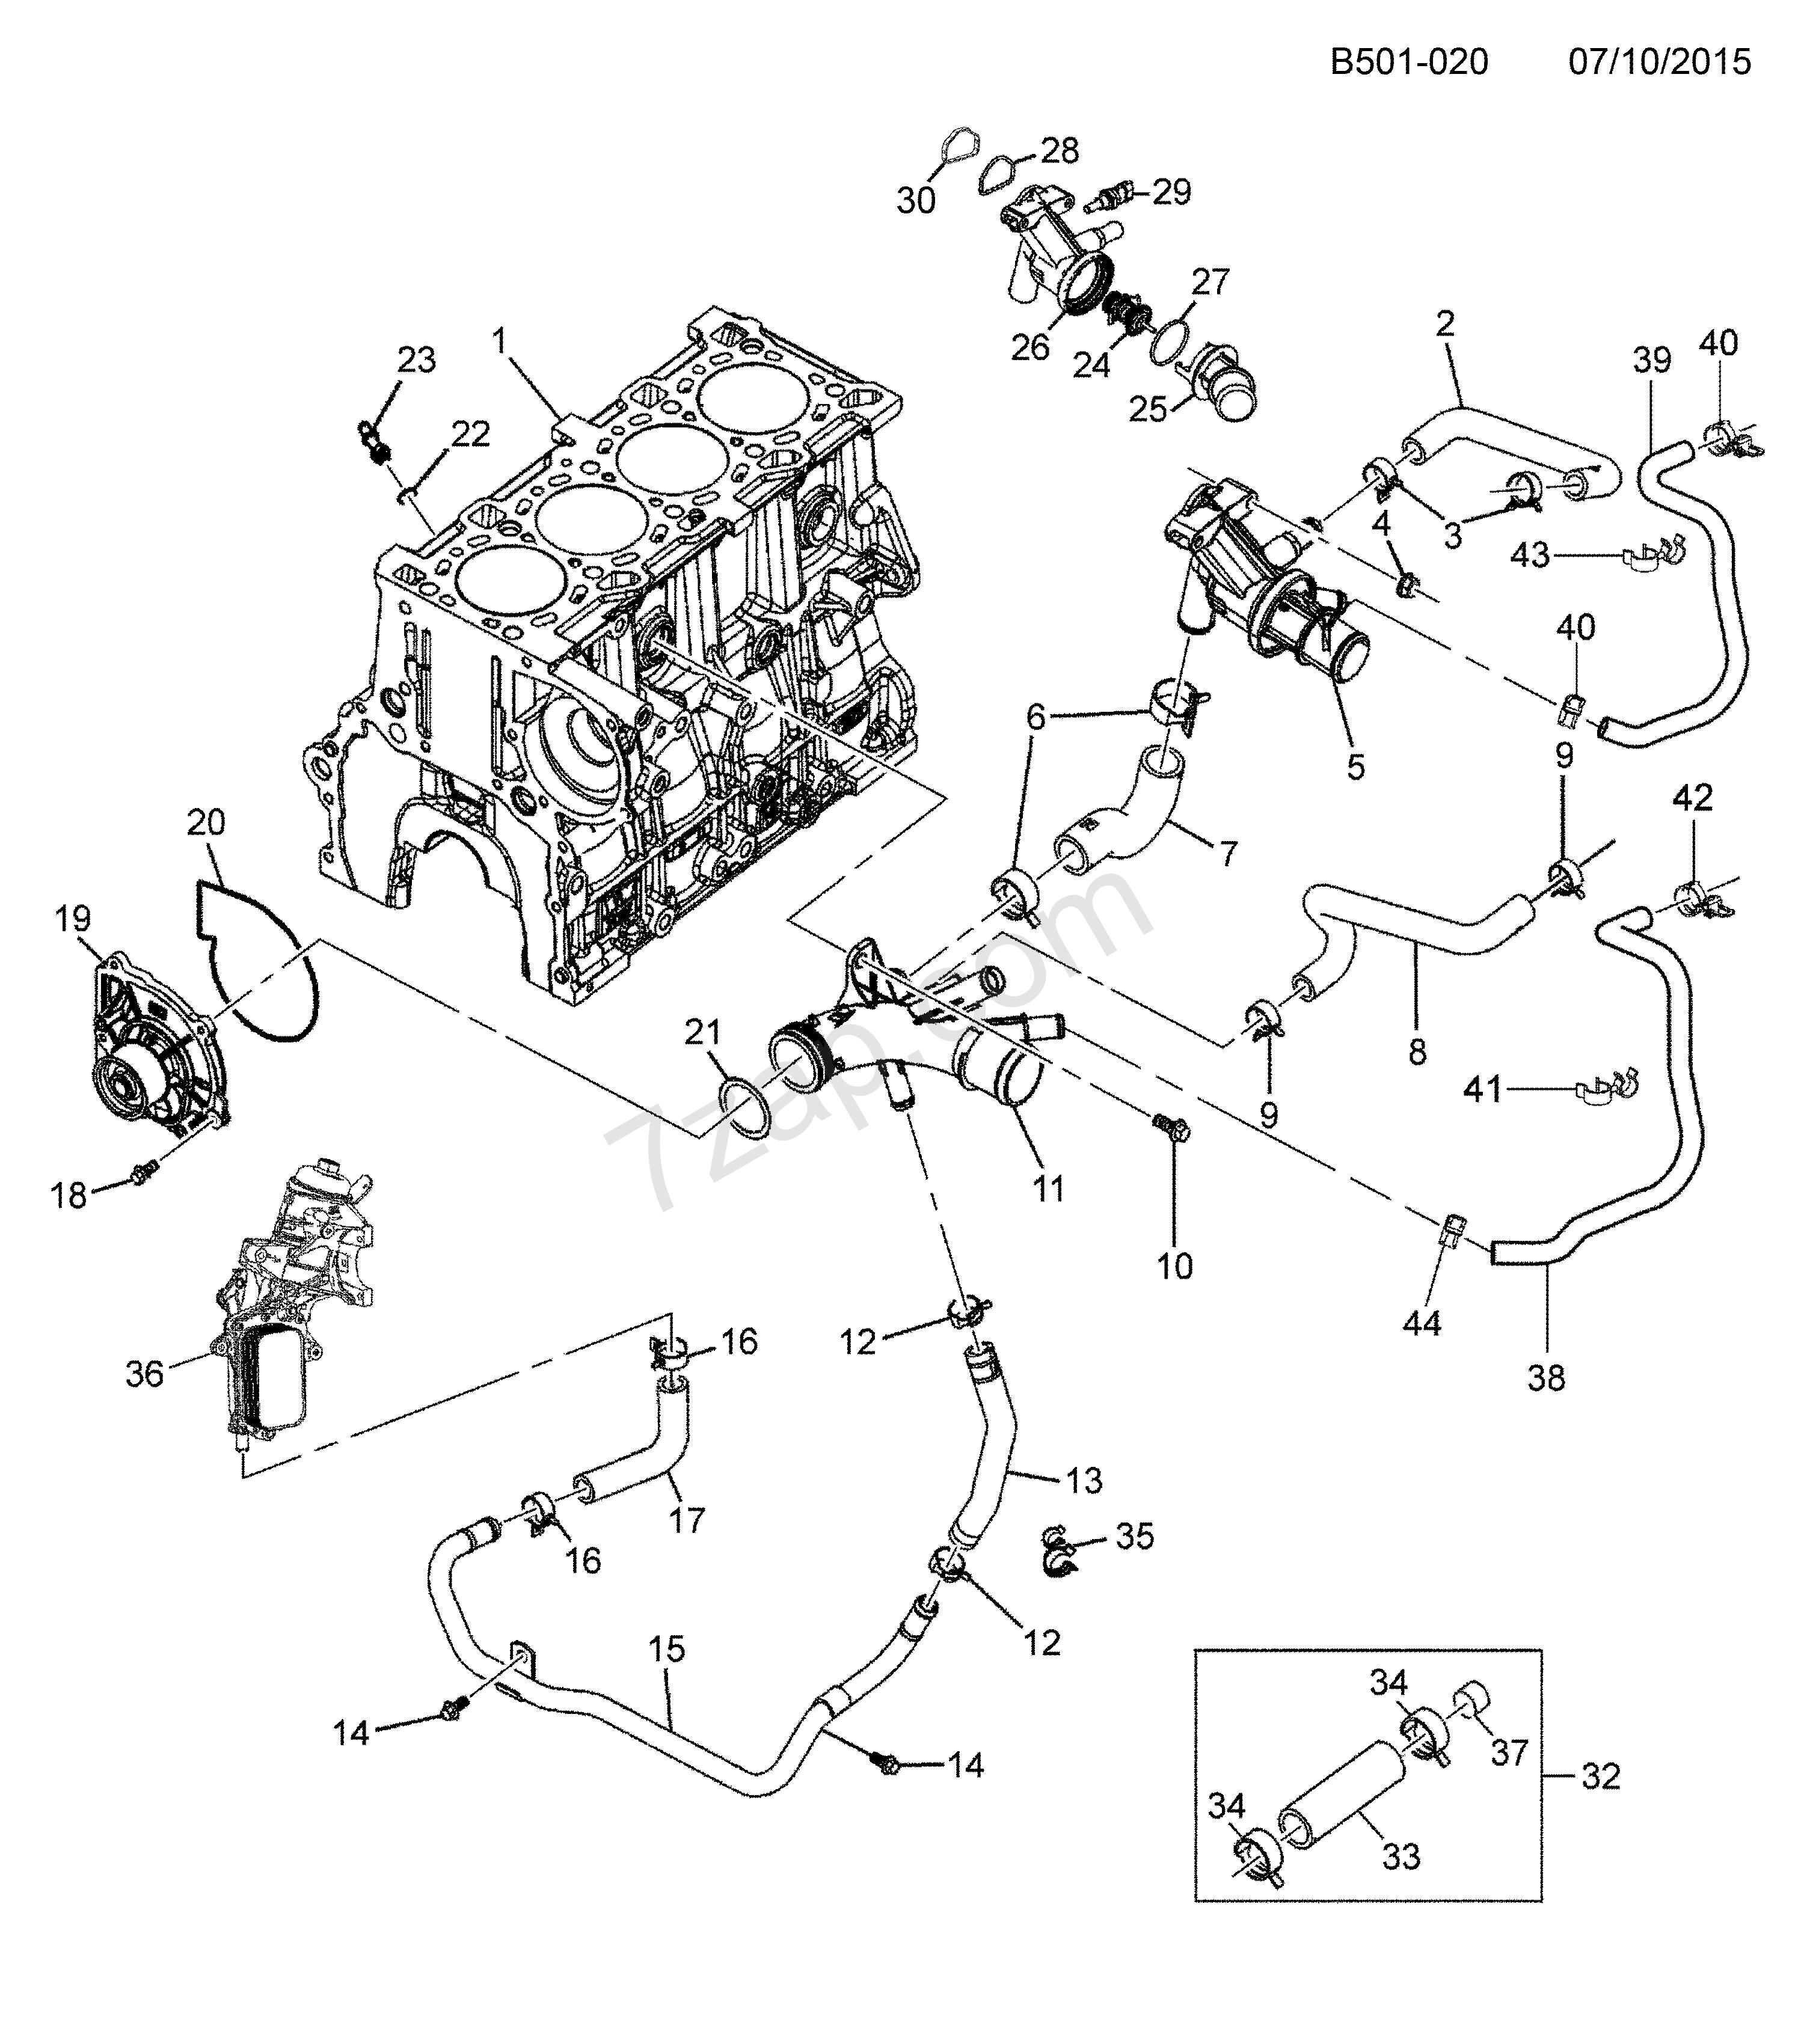 Colorado 3 5l Engine Parts Diagram - 2003 Chrysler Sebring Fuse Box Diagram  - furnaces.yenpancane.jeanjaures37.fr | Chevy 3 5l Engine Parts Diagram |  | Wiring Diagram Resource